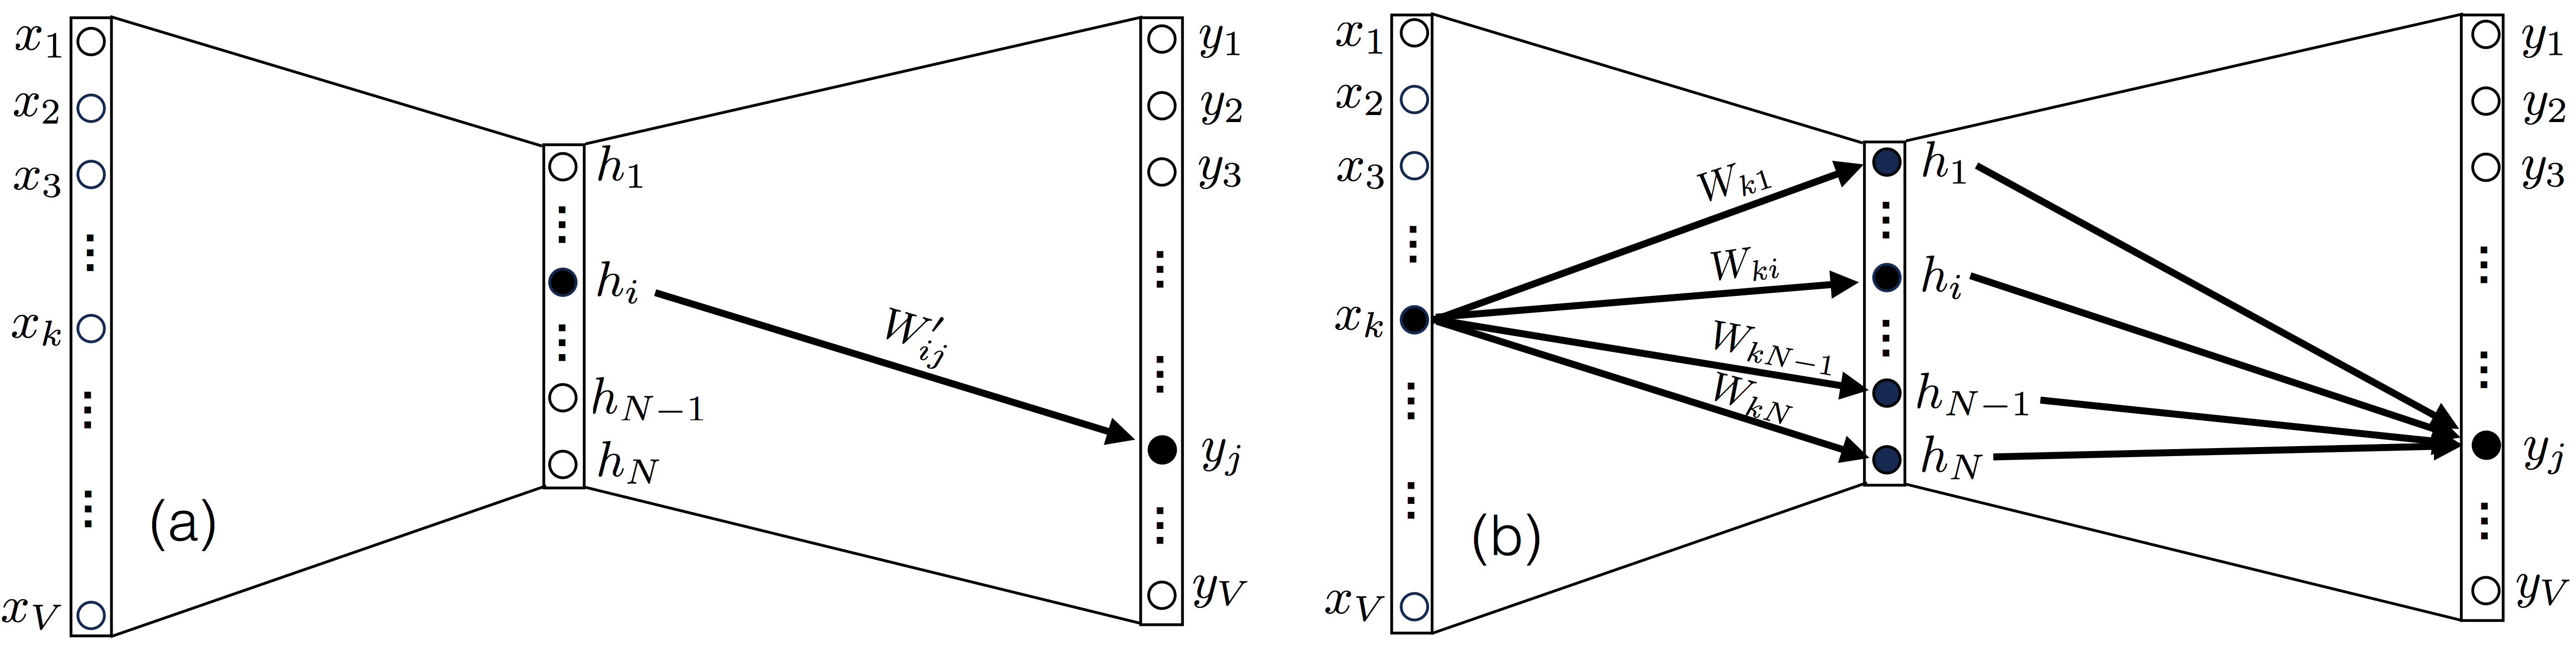 The backpropagation algorithm for Word2Vec | Marginalia